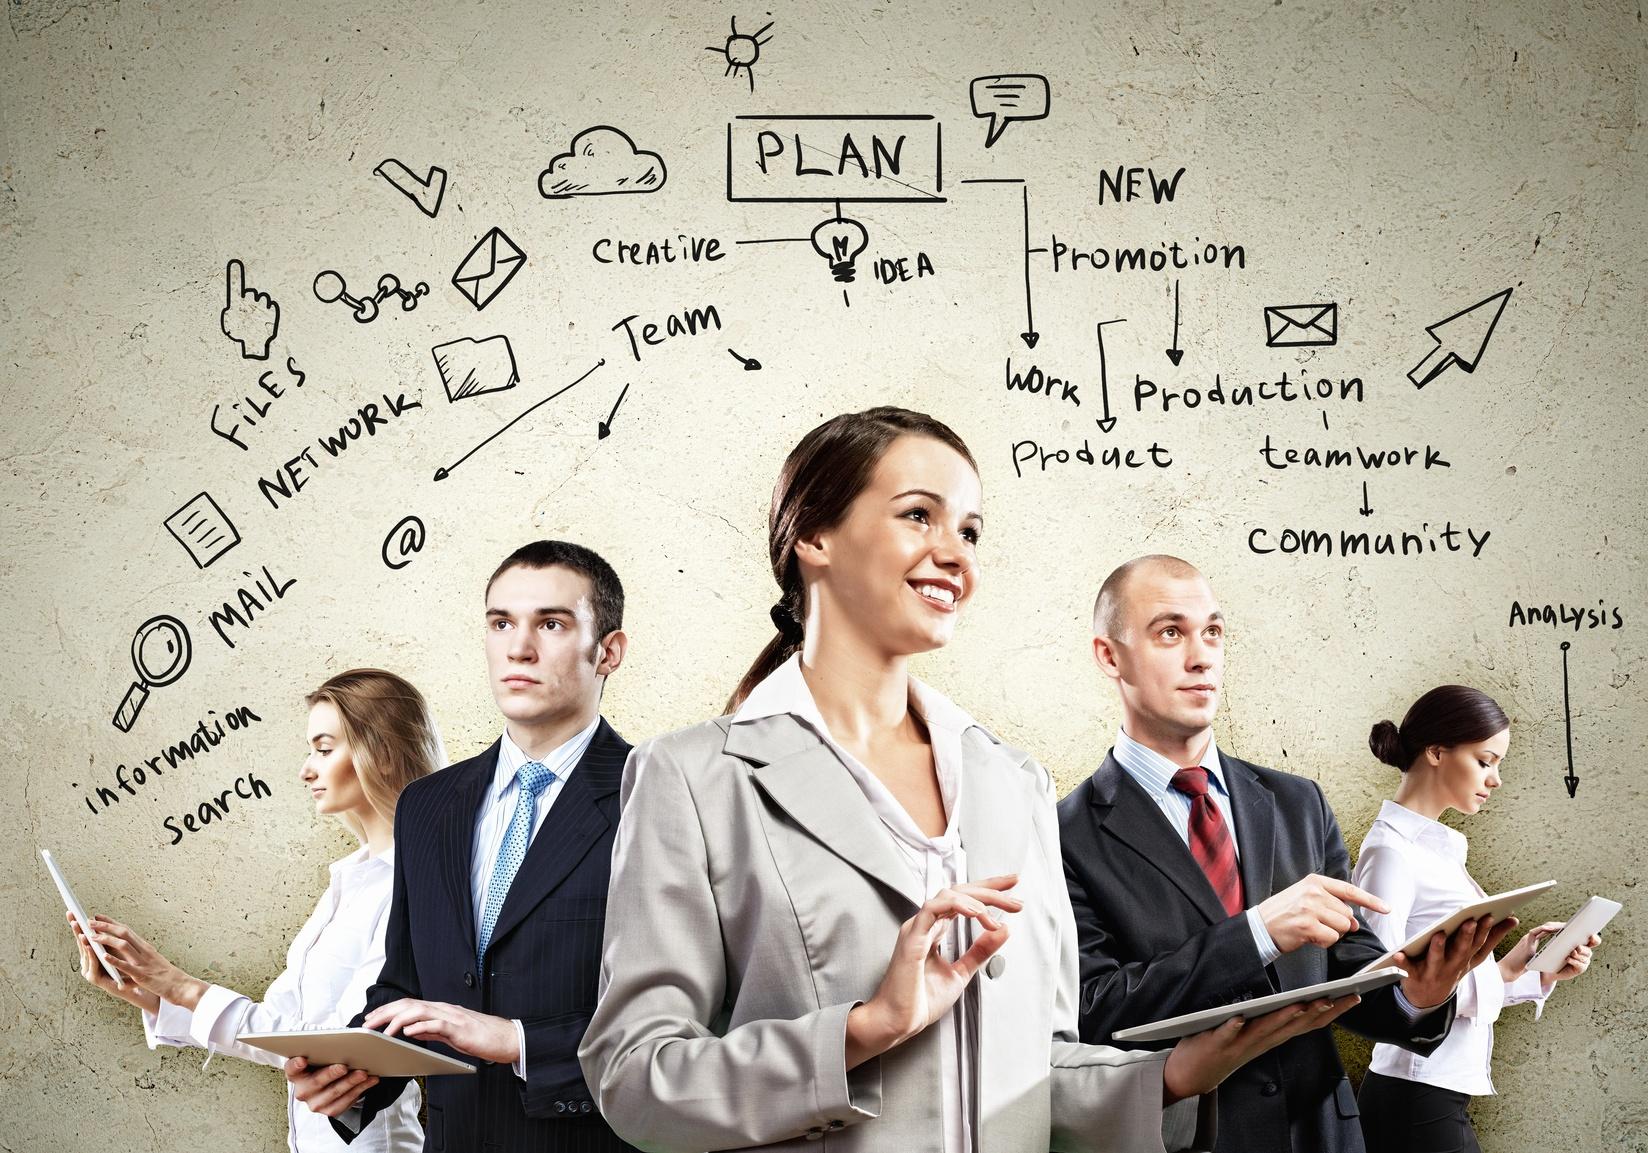 Corporate communication strategy